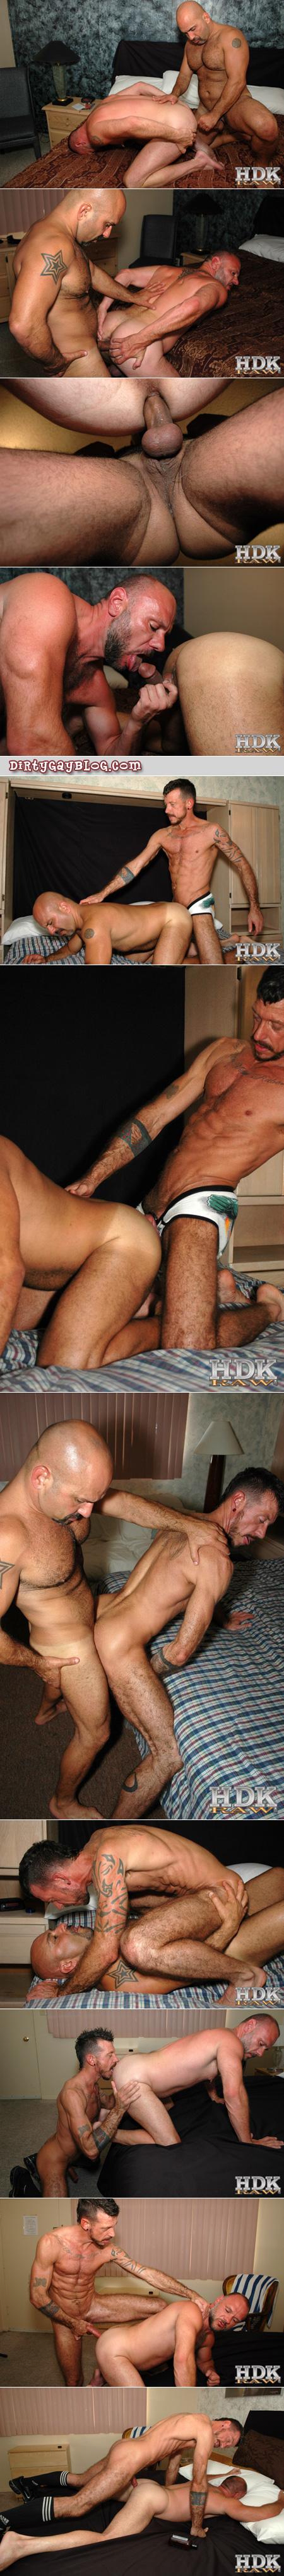 Compilation of gay bareback sex and cumshots.